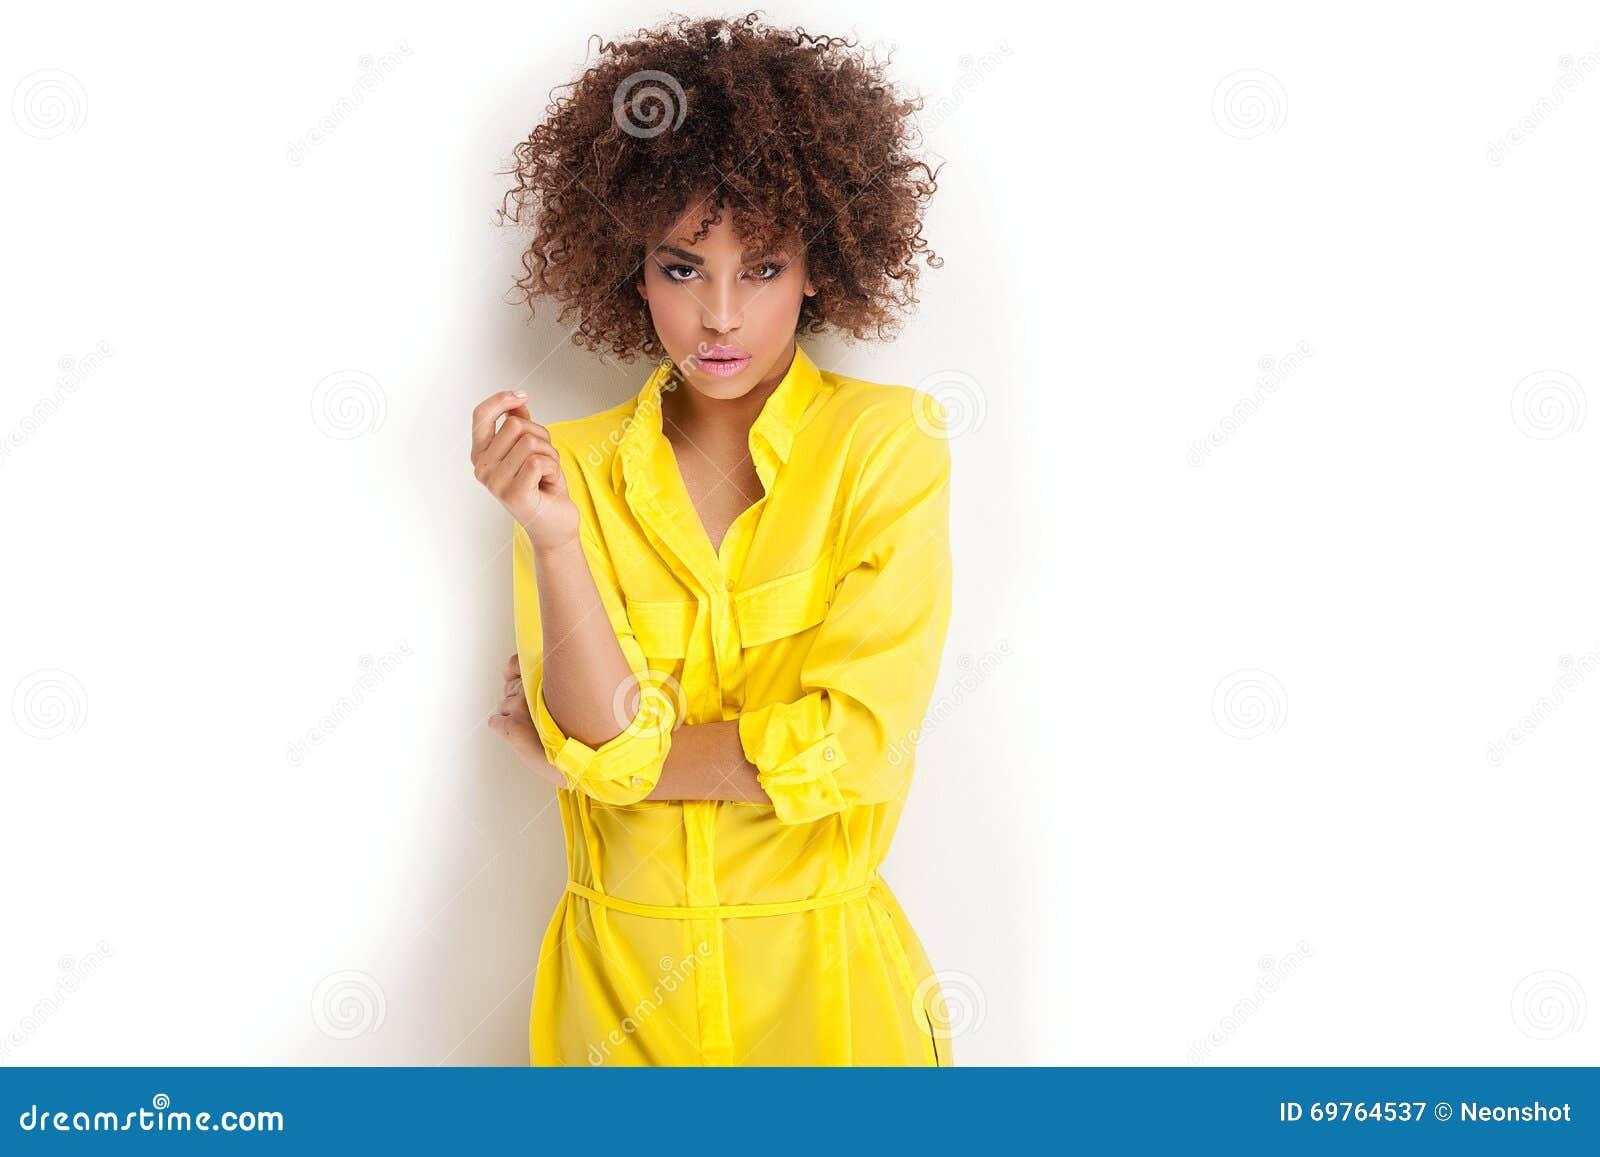 Retrato de la chica joven con afro